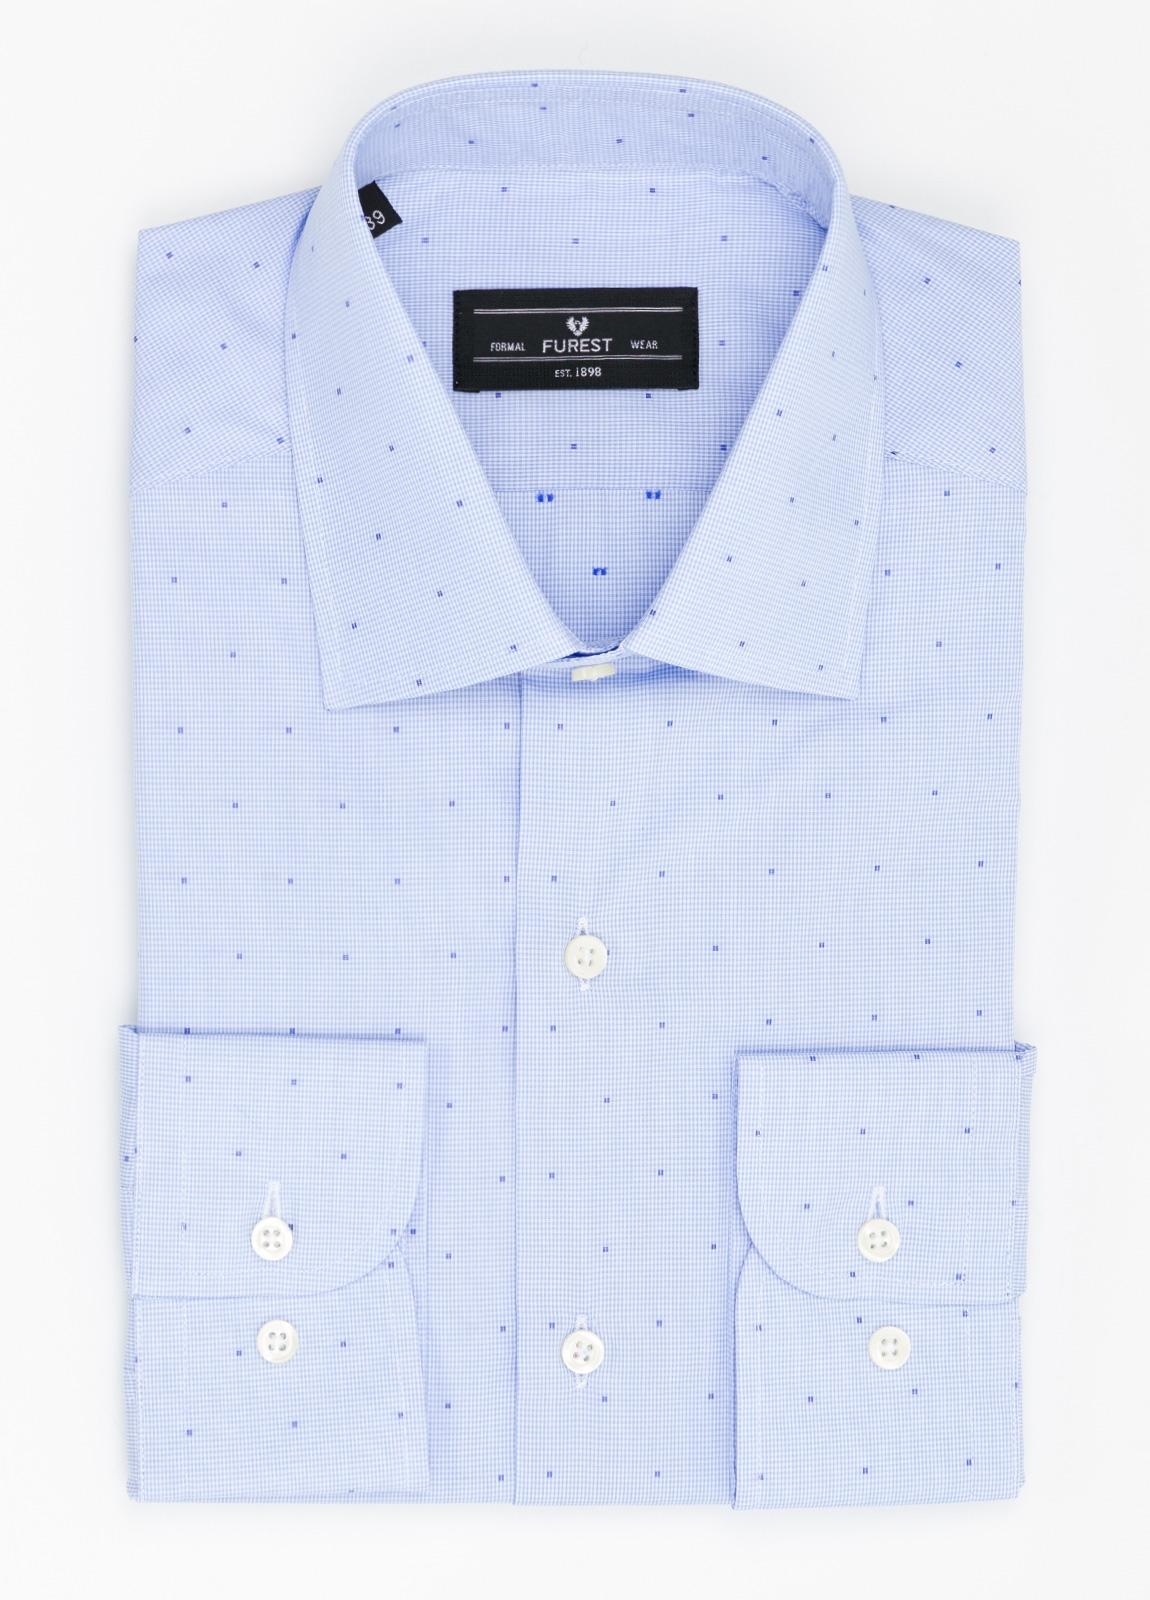 Camisa Formal Wear SLIM FIT cuello italiano modelo ROMA micro dibujo color celeste, 100% Algodón.